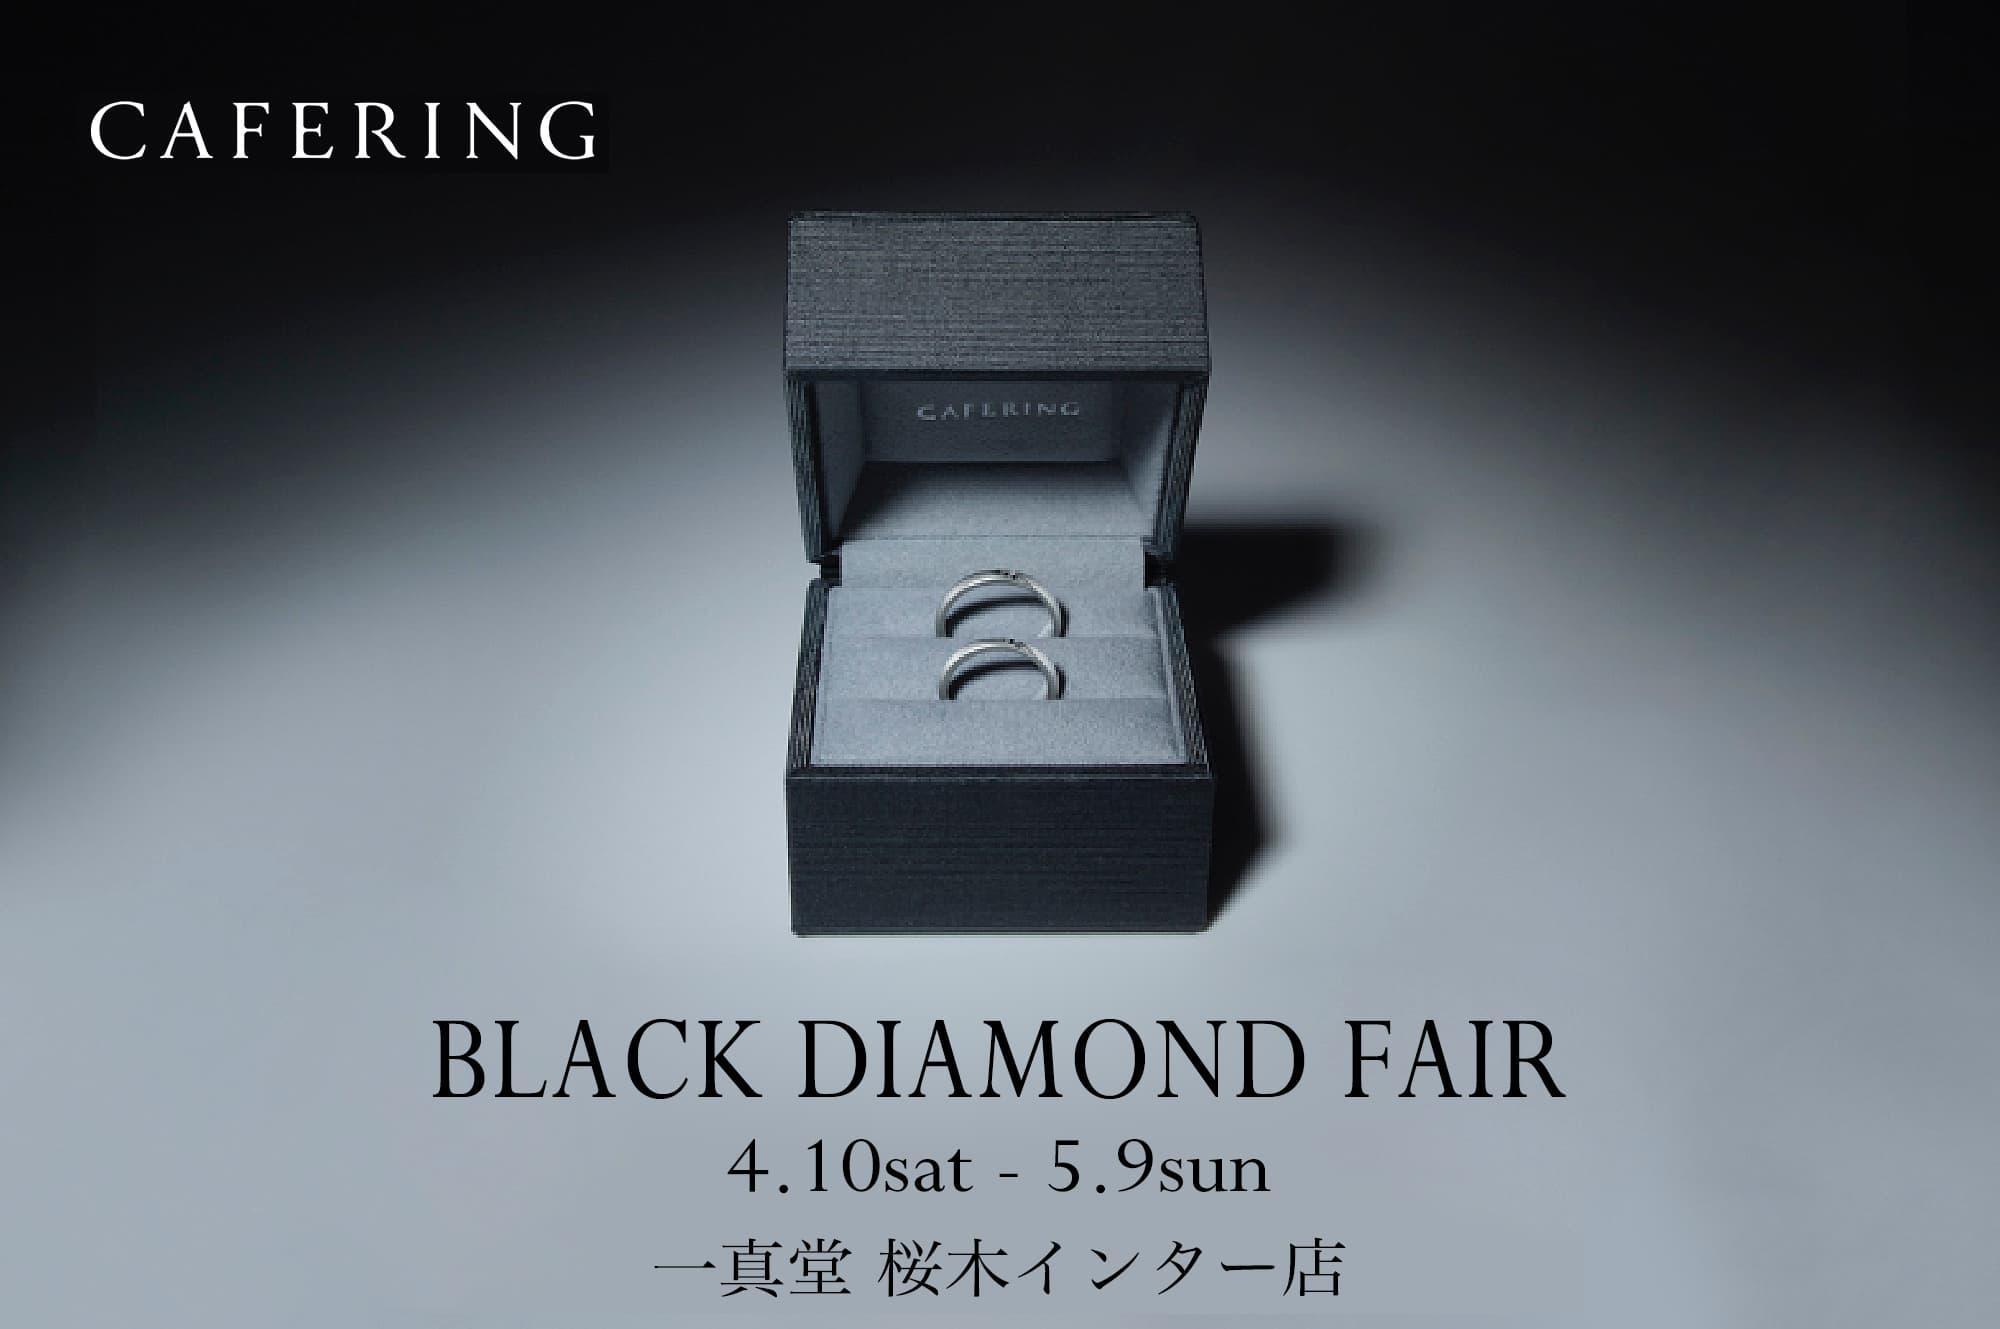 cafering black diamond fair